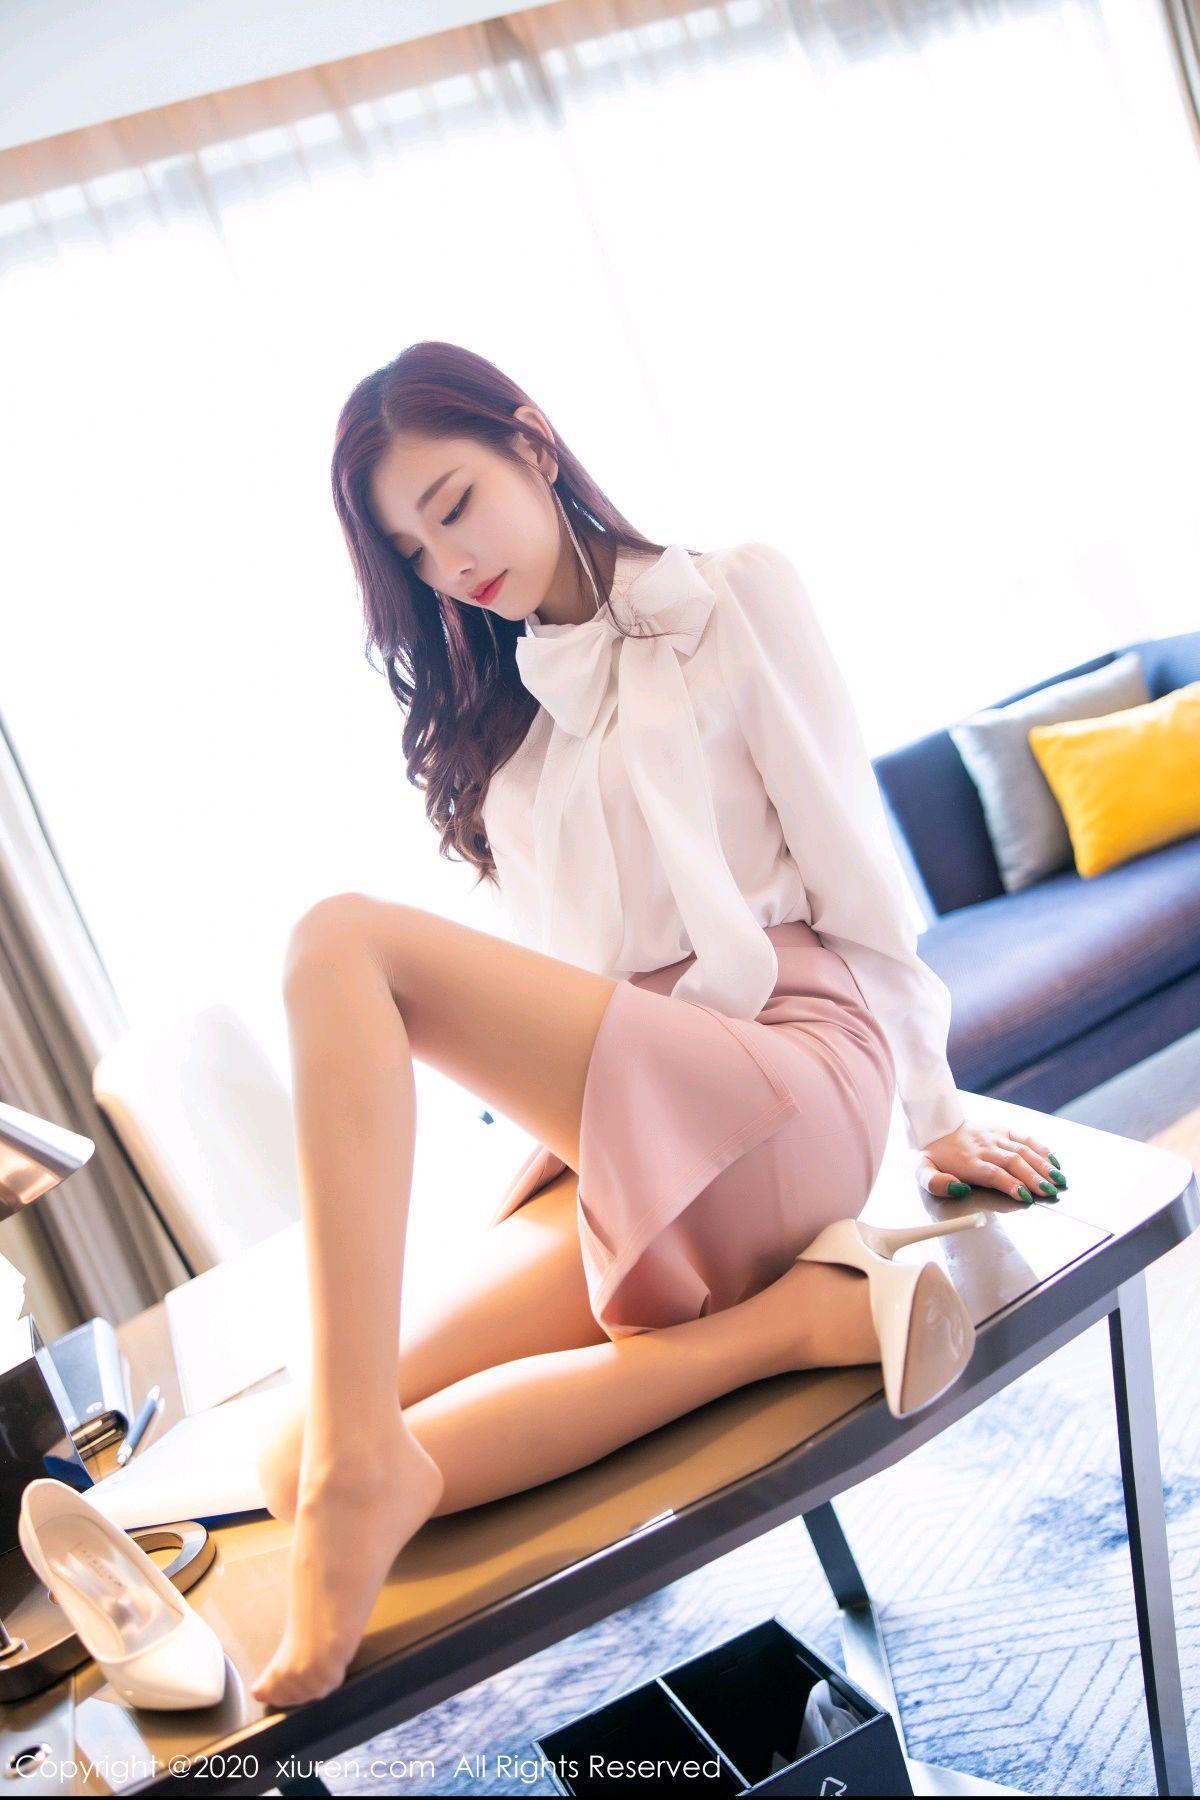 [XiuRen] Vol.2431 Yang Chen Chen 29P, Tall, Underwear, Uniform, Xiuren, Yang Chen Chen